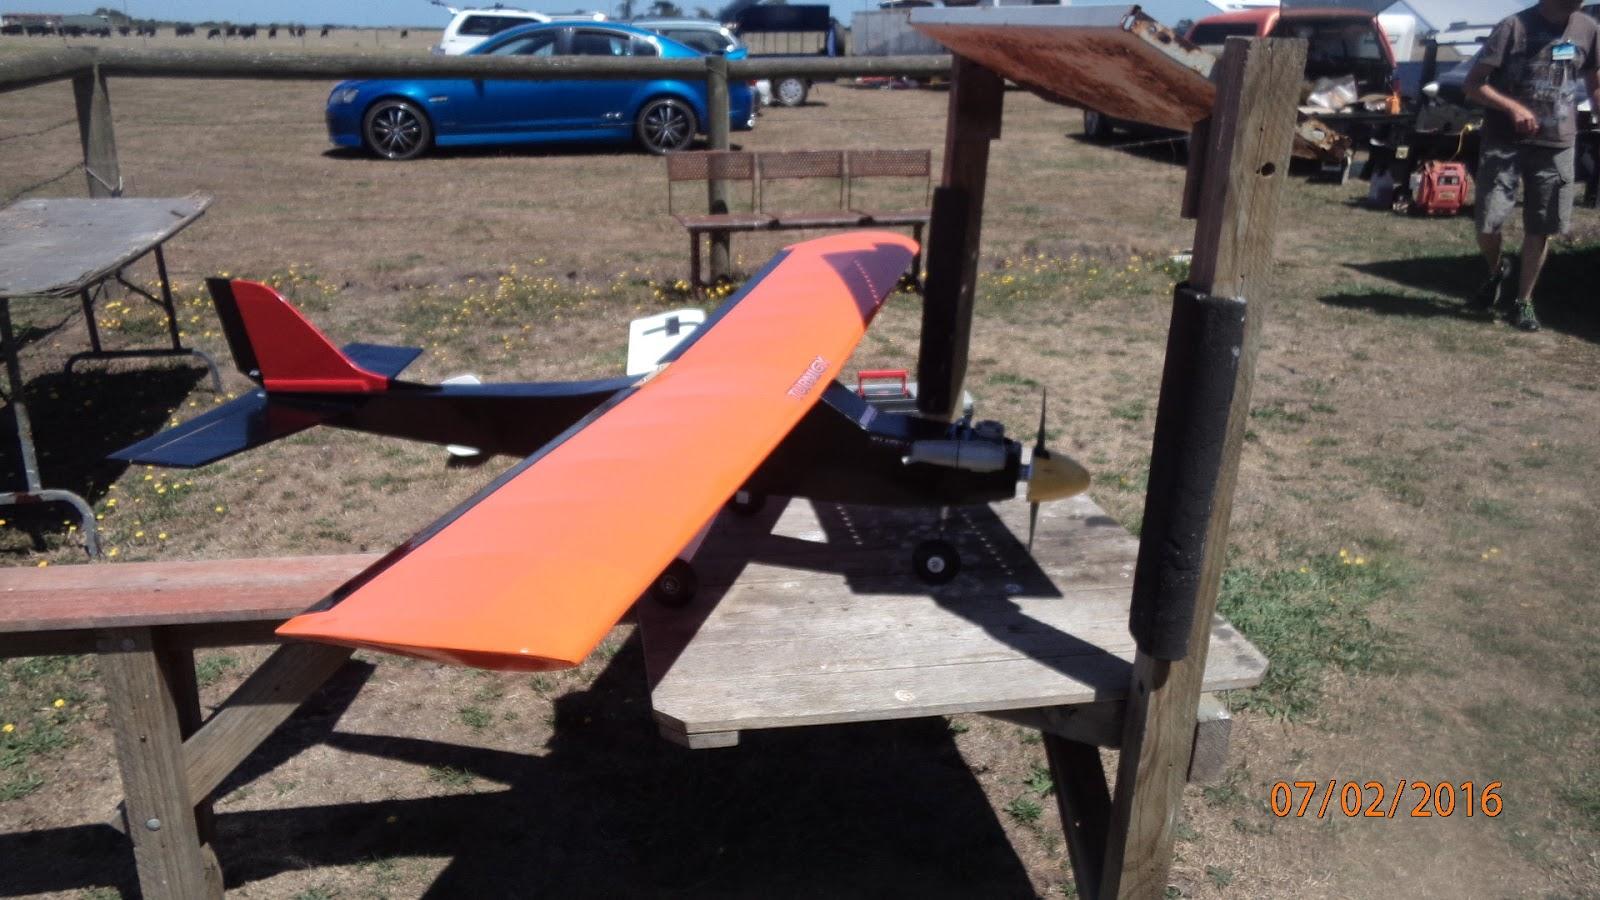 South West Amalgamated Model Plane Society - SWAMPS: SWAMPS